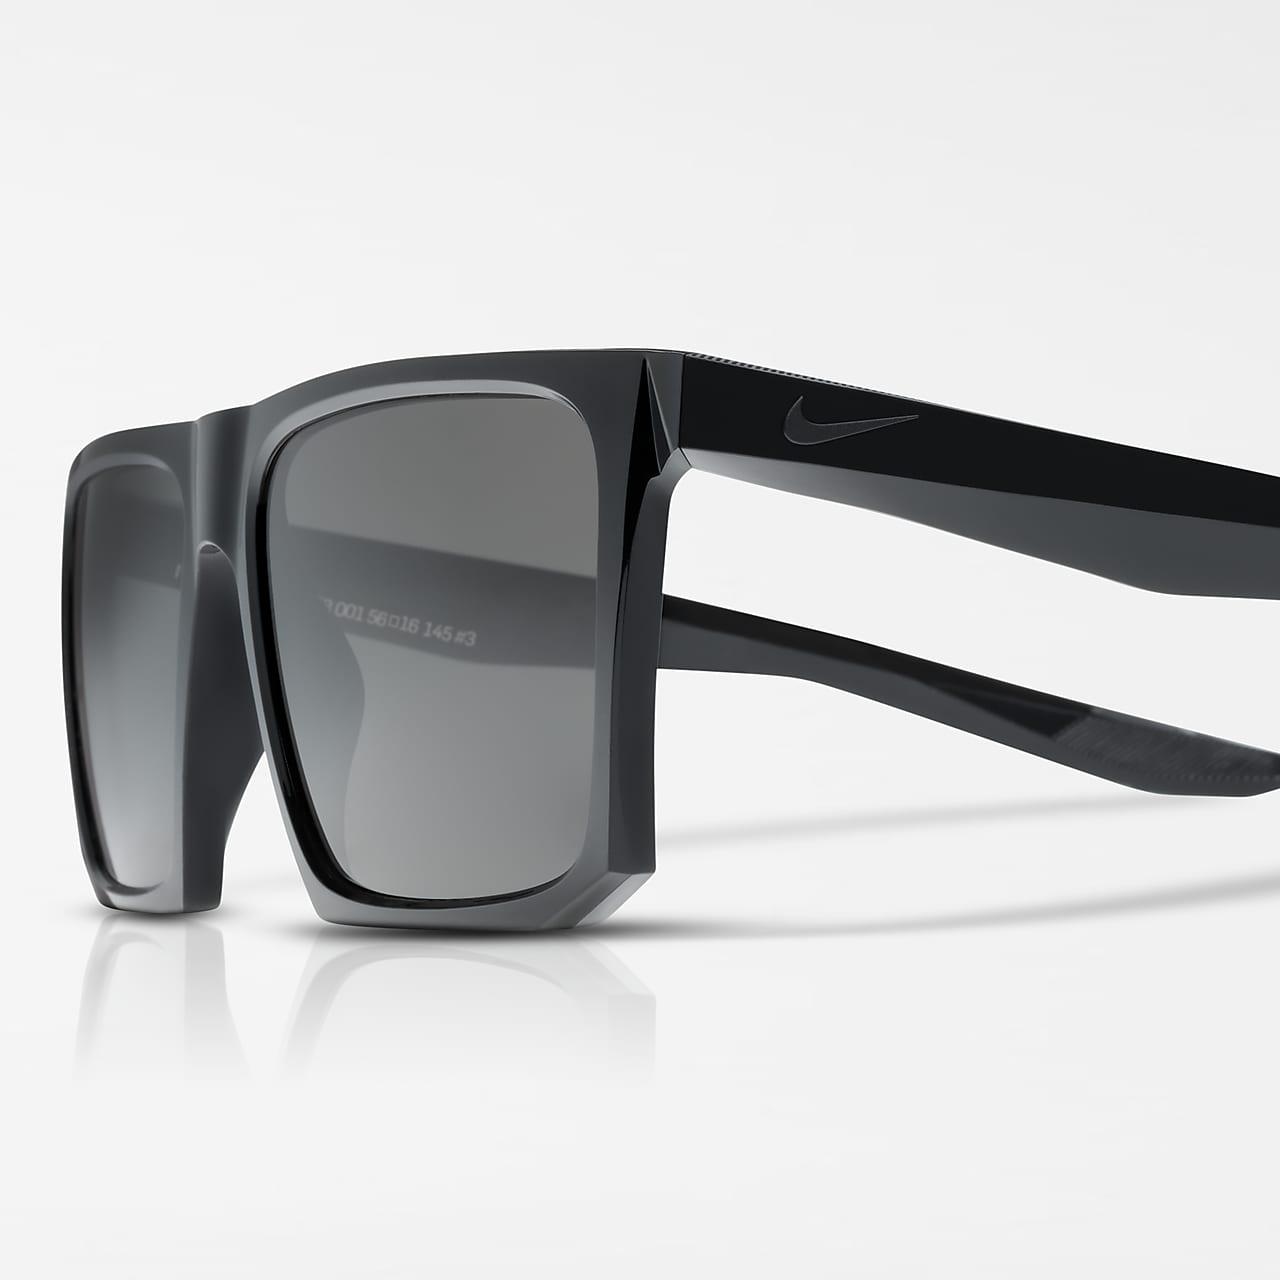 b4a94ea1c7 Γυαλιά ηλίου Nike SB Ledge. Nike.com GR